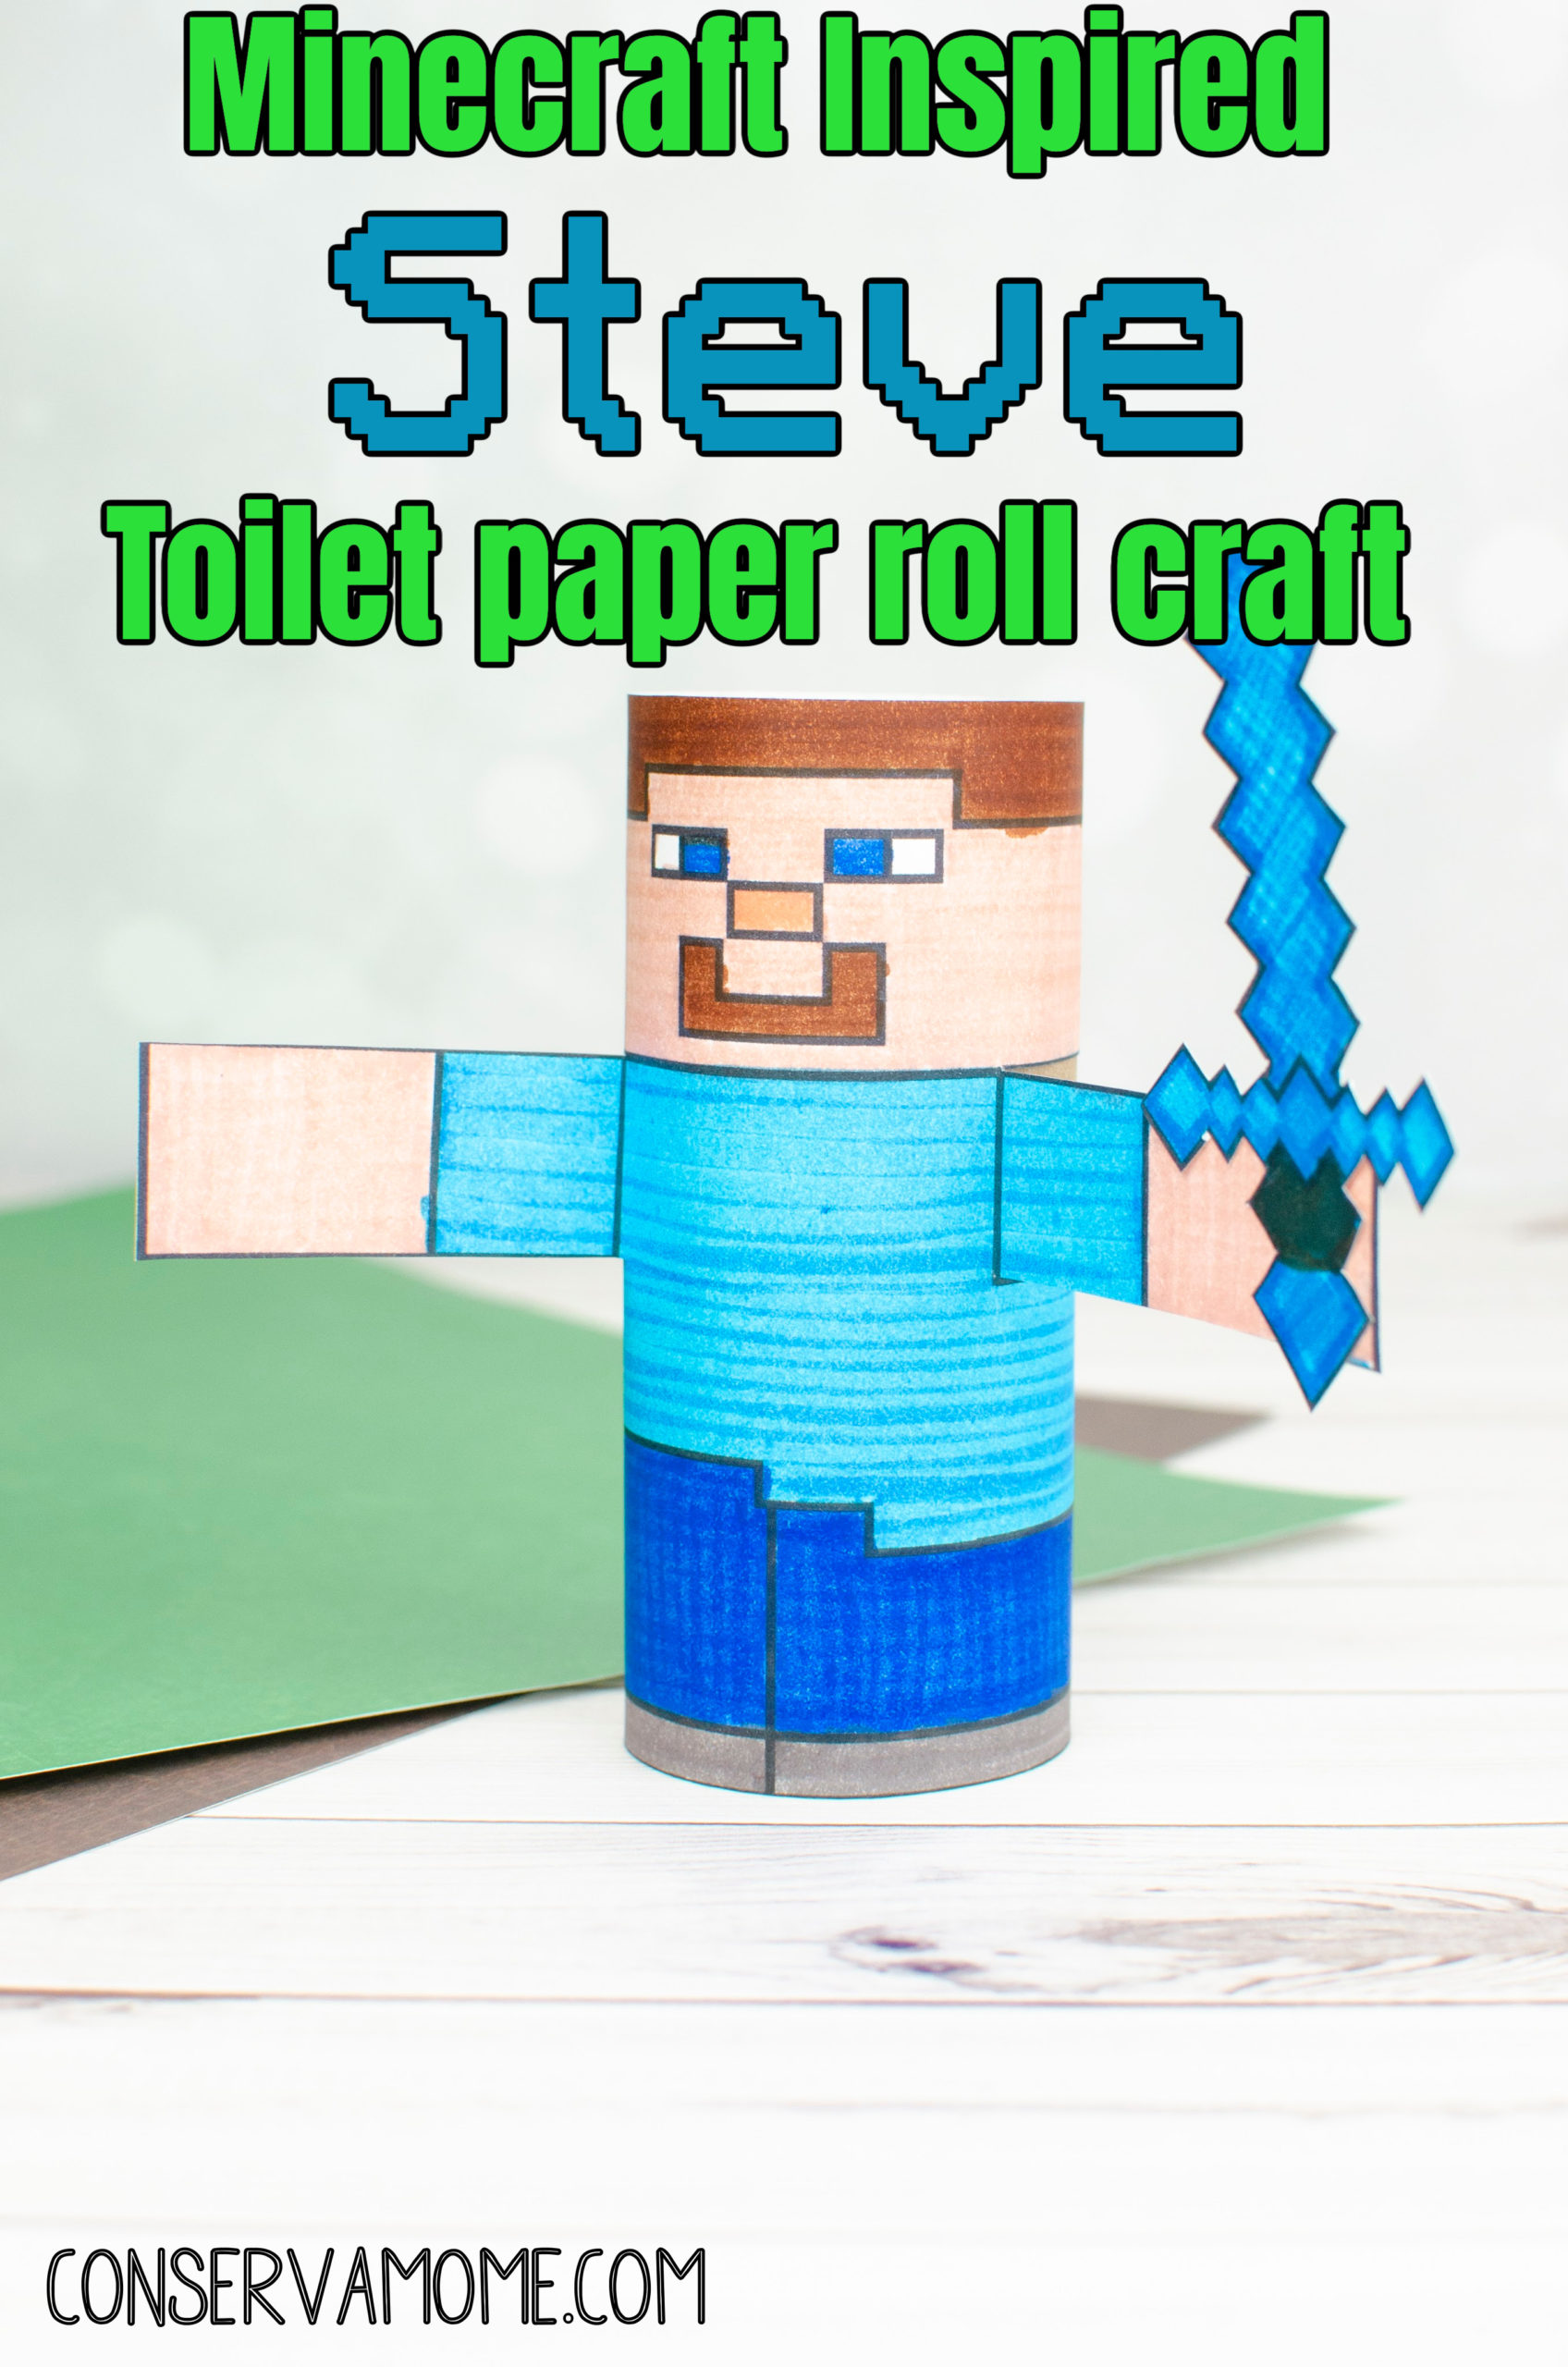 DIY Minecraft Steve Toilet paper roll craft